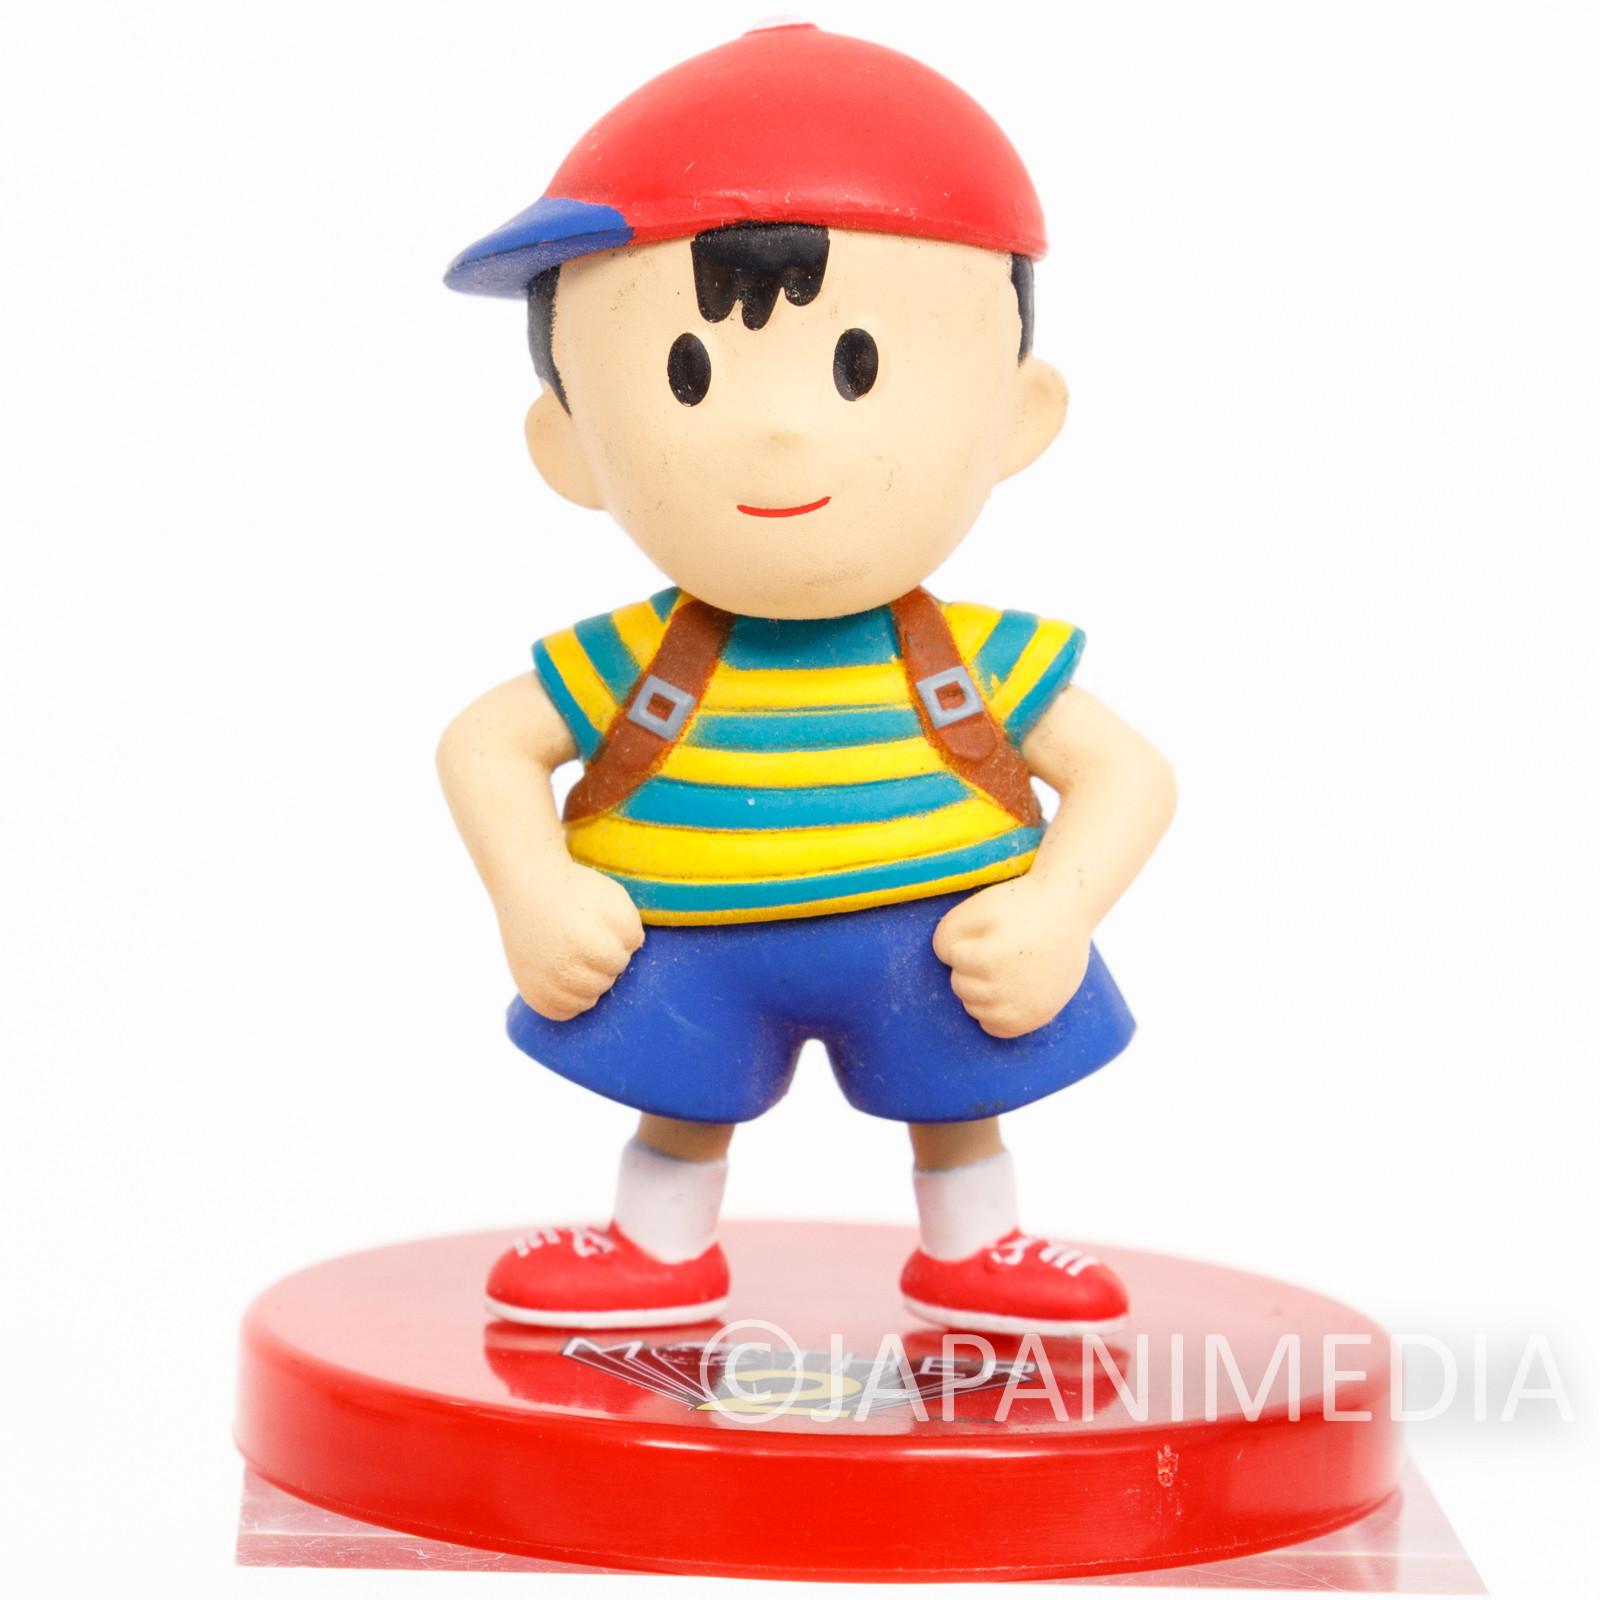 Mother 2 Ness Stand Figure Takara Tomy Nintendo JAPAN GAME NES FAMICOM